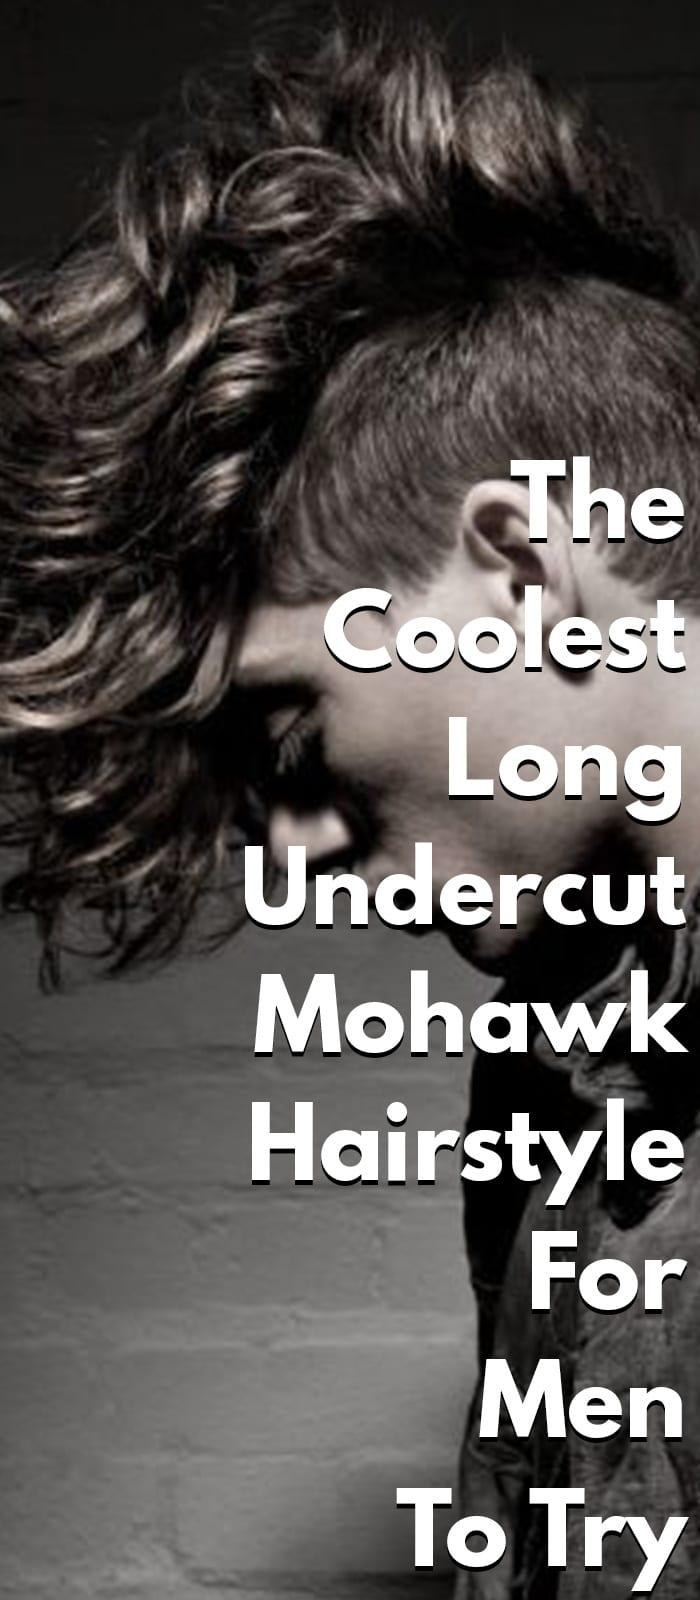 Long Undercut Mohawk Hairstyle